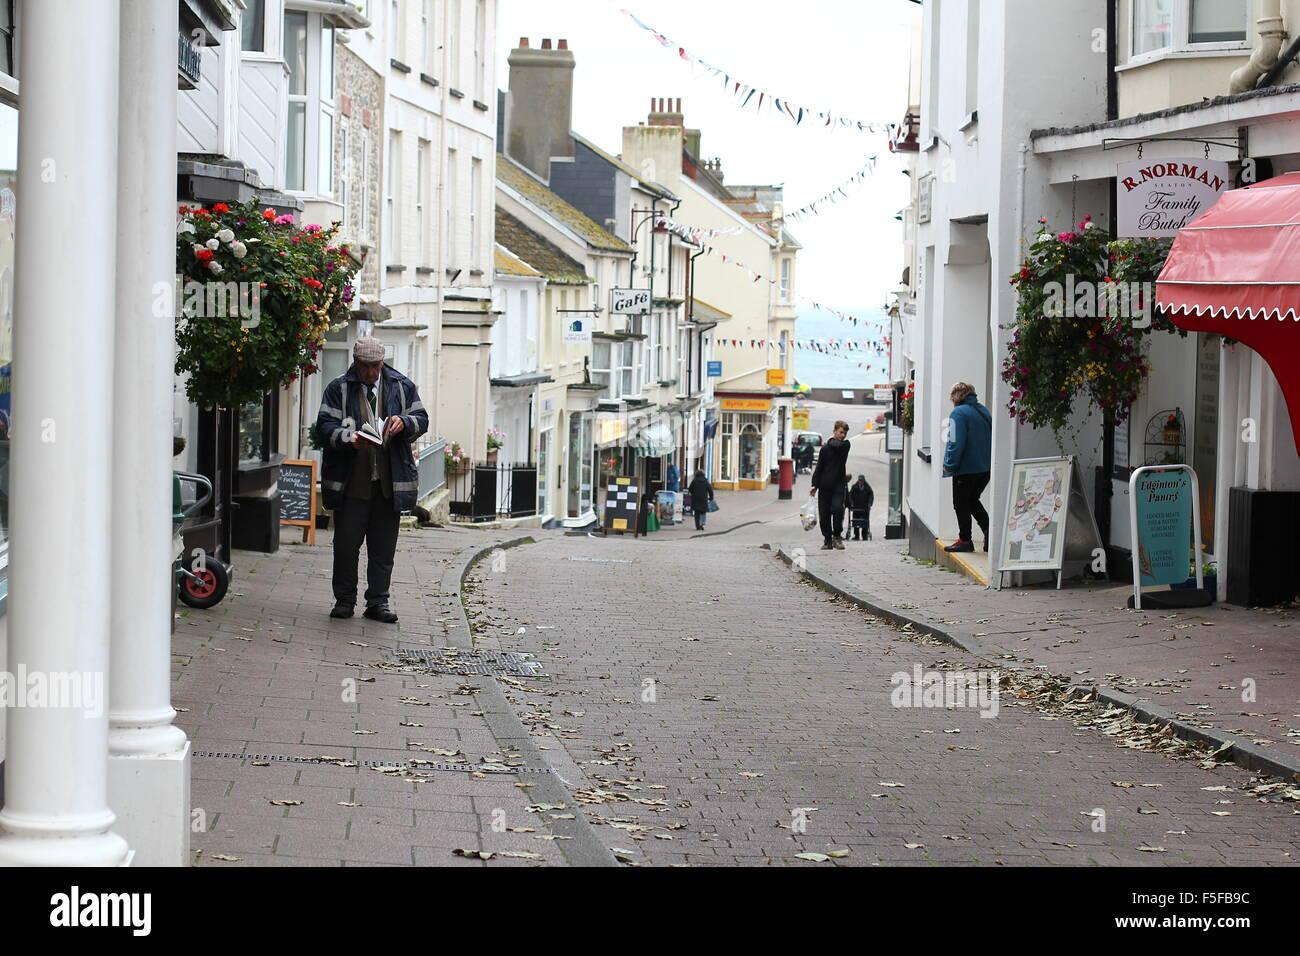 Street scene following road - Stock Image